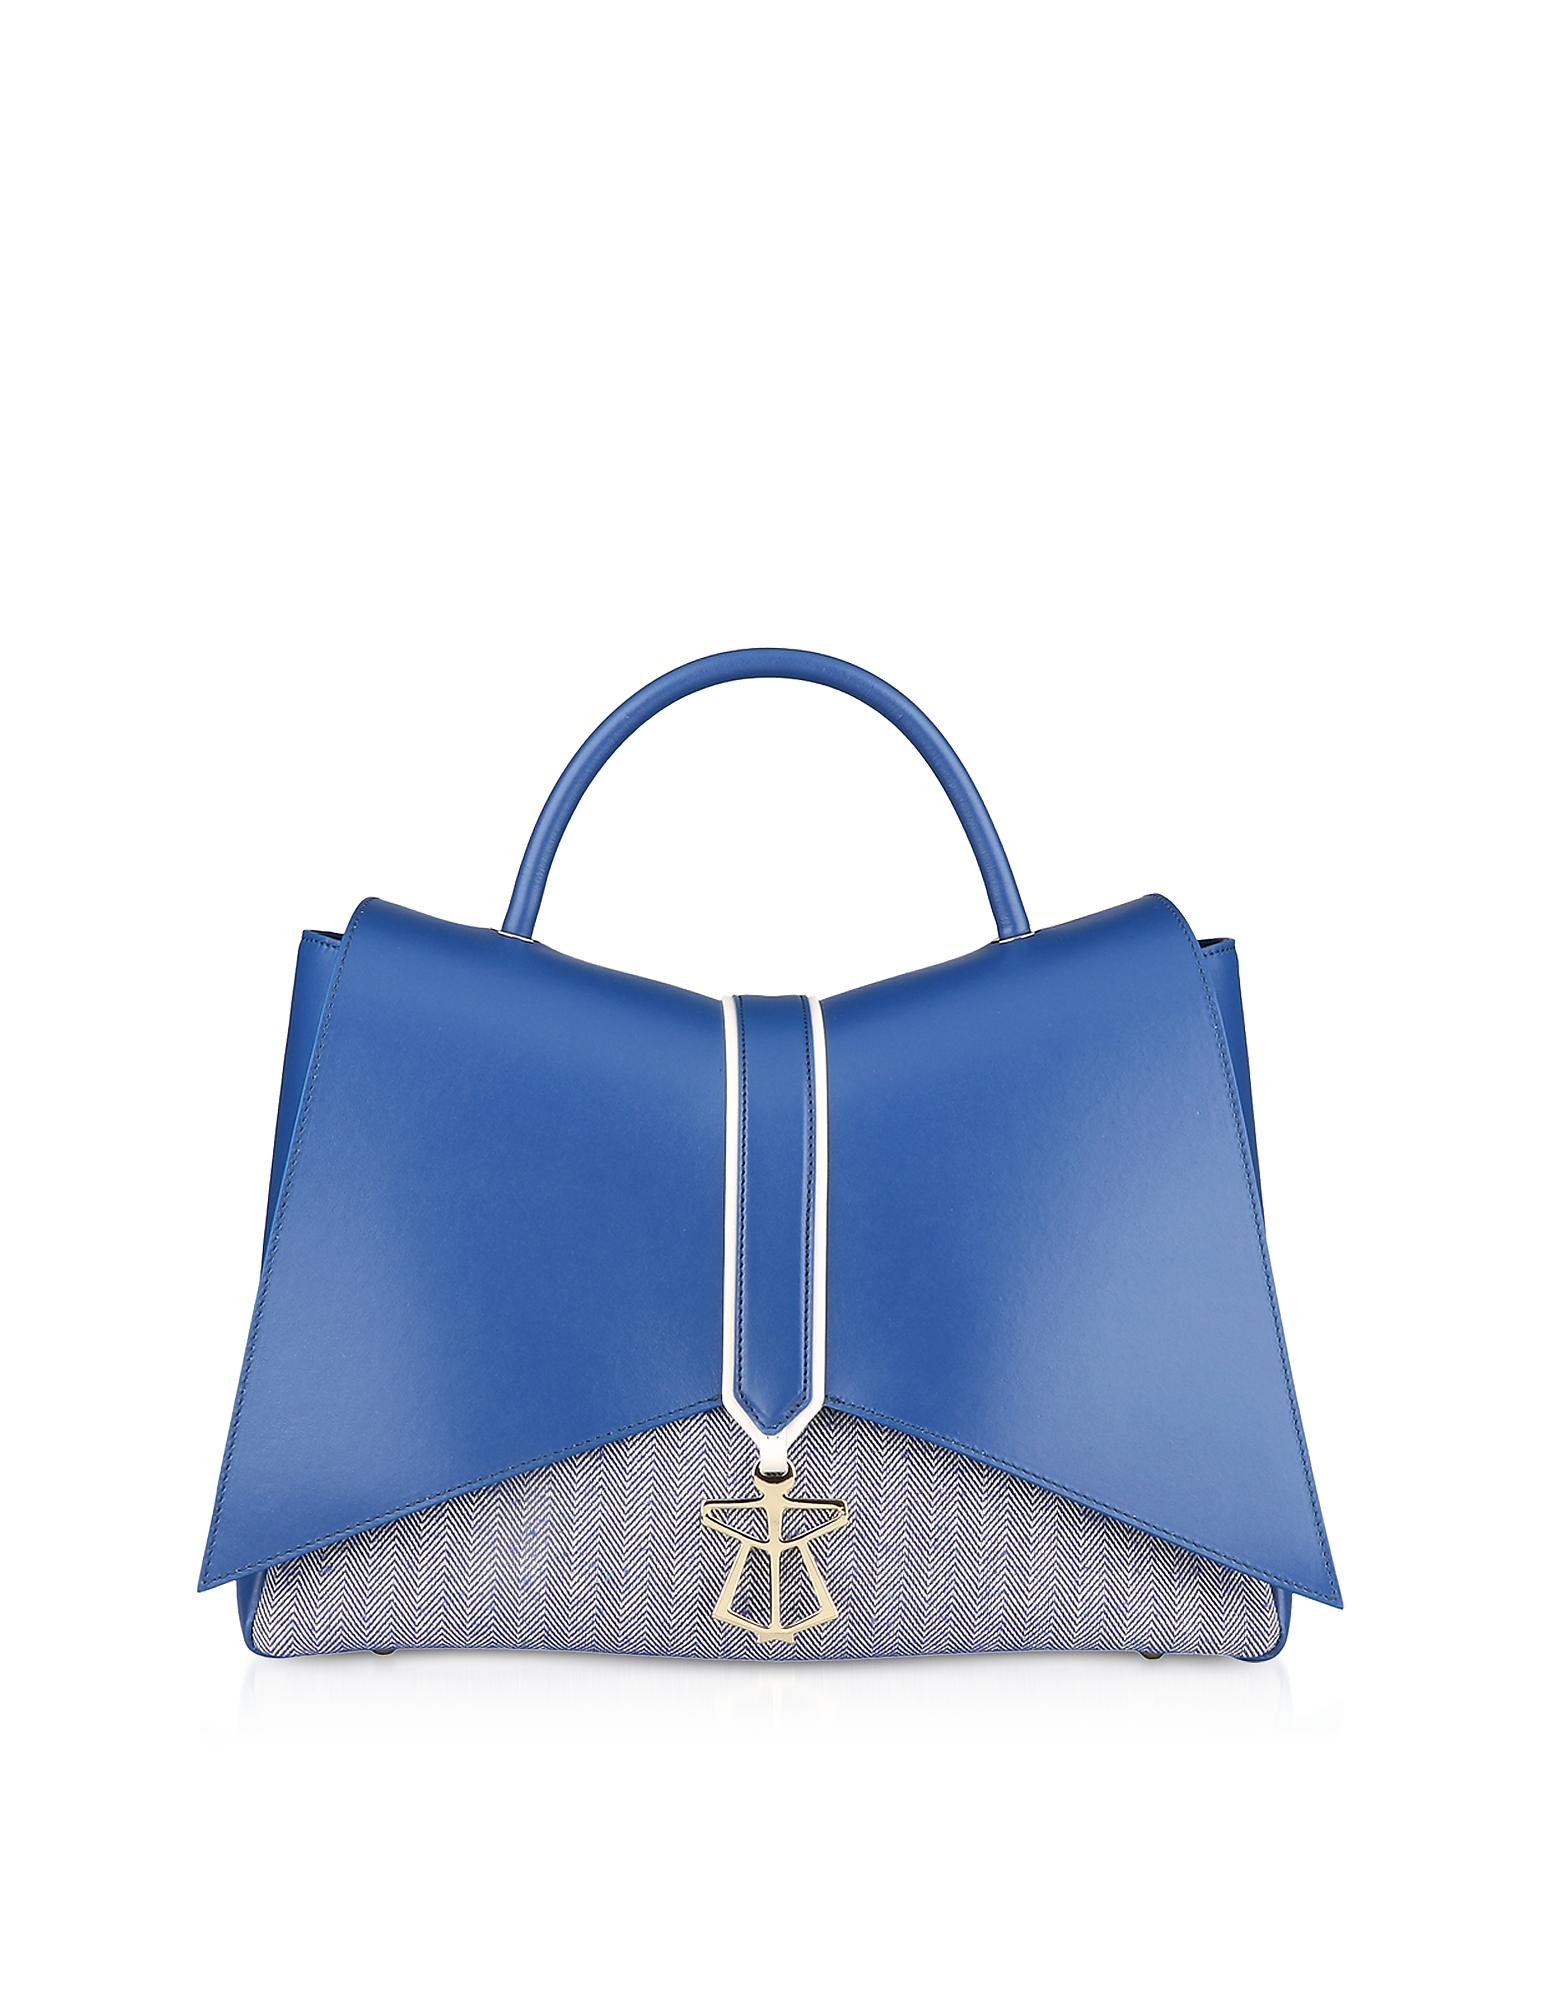 Lara Bellini Designer Handbags, Blue Canvas Kiki Top Handle Satchel Bag